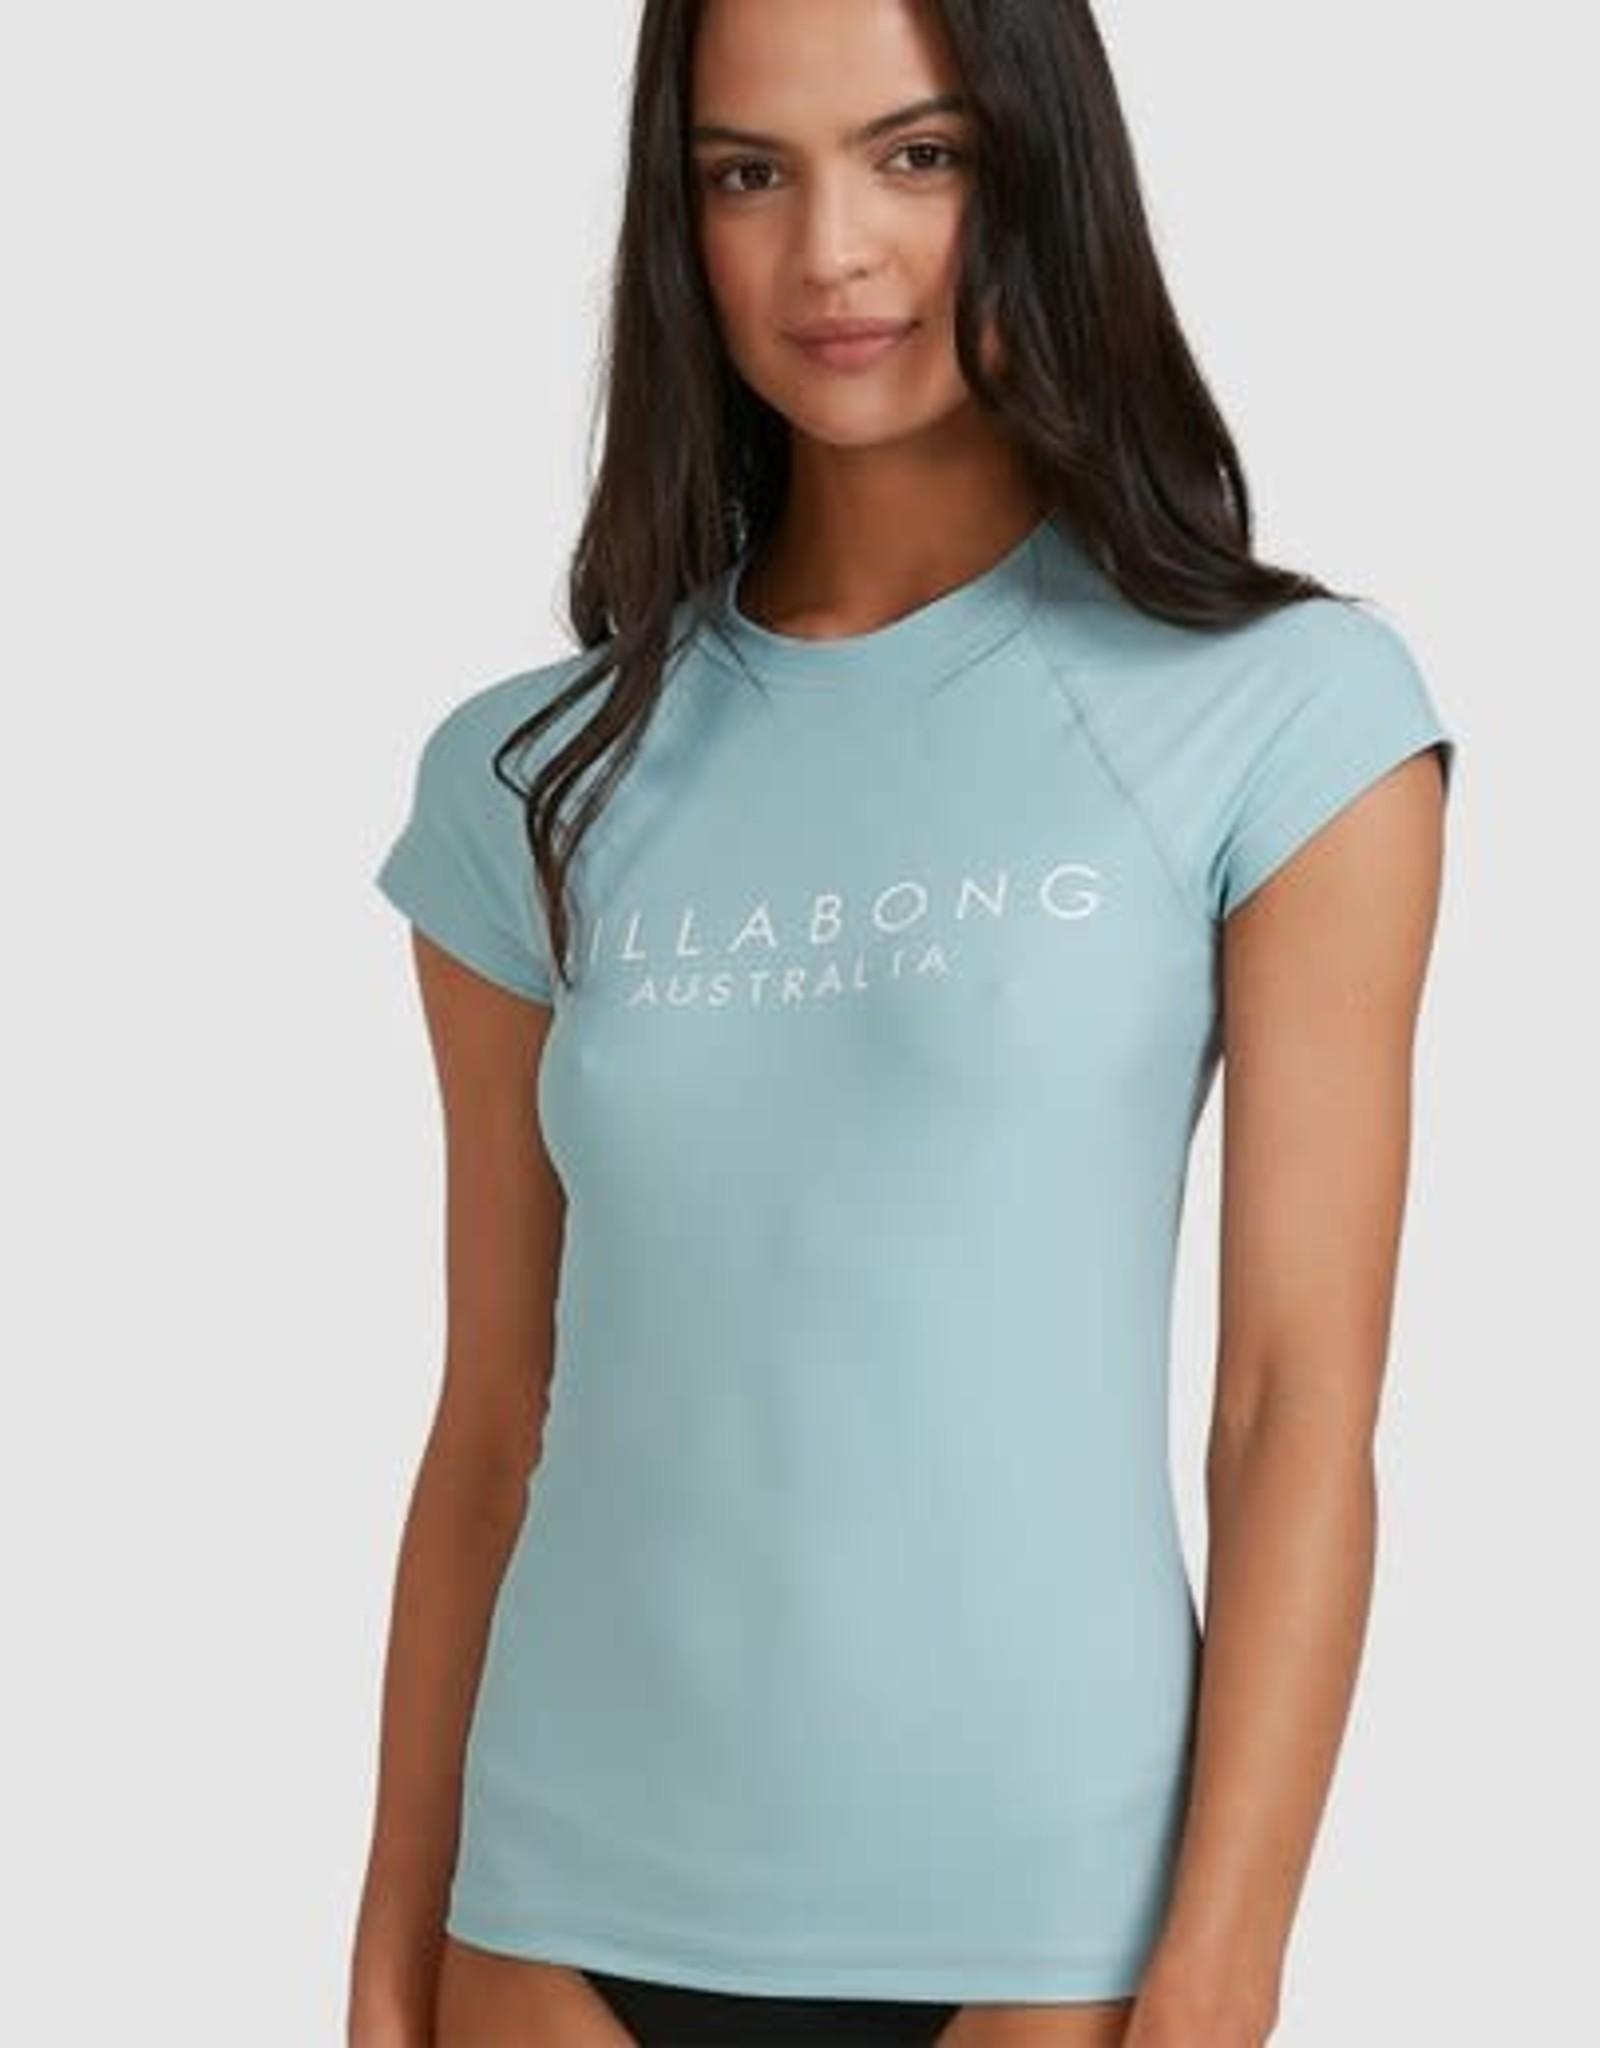 BILLABONG Serenity Short Sleeve Sunshirt